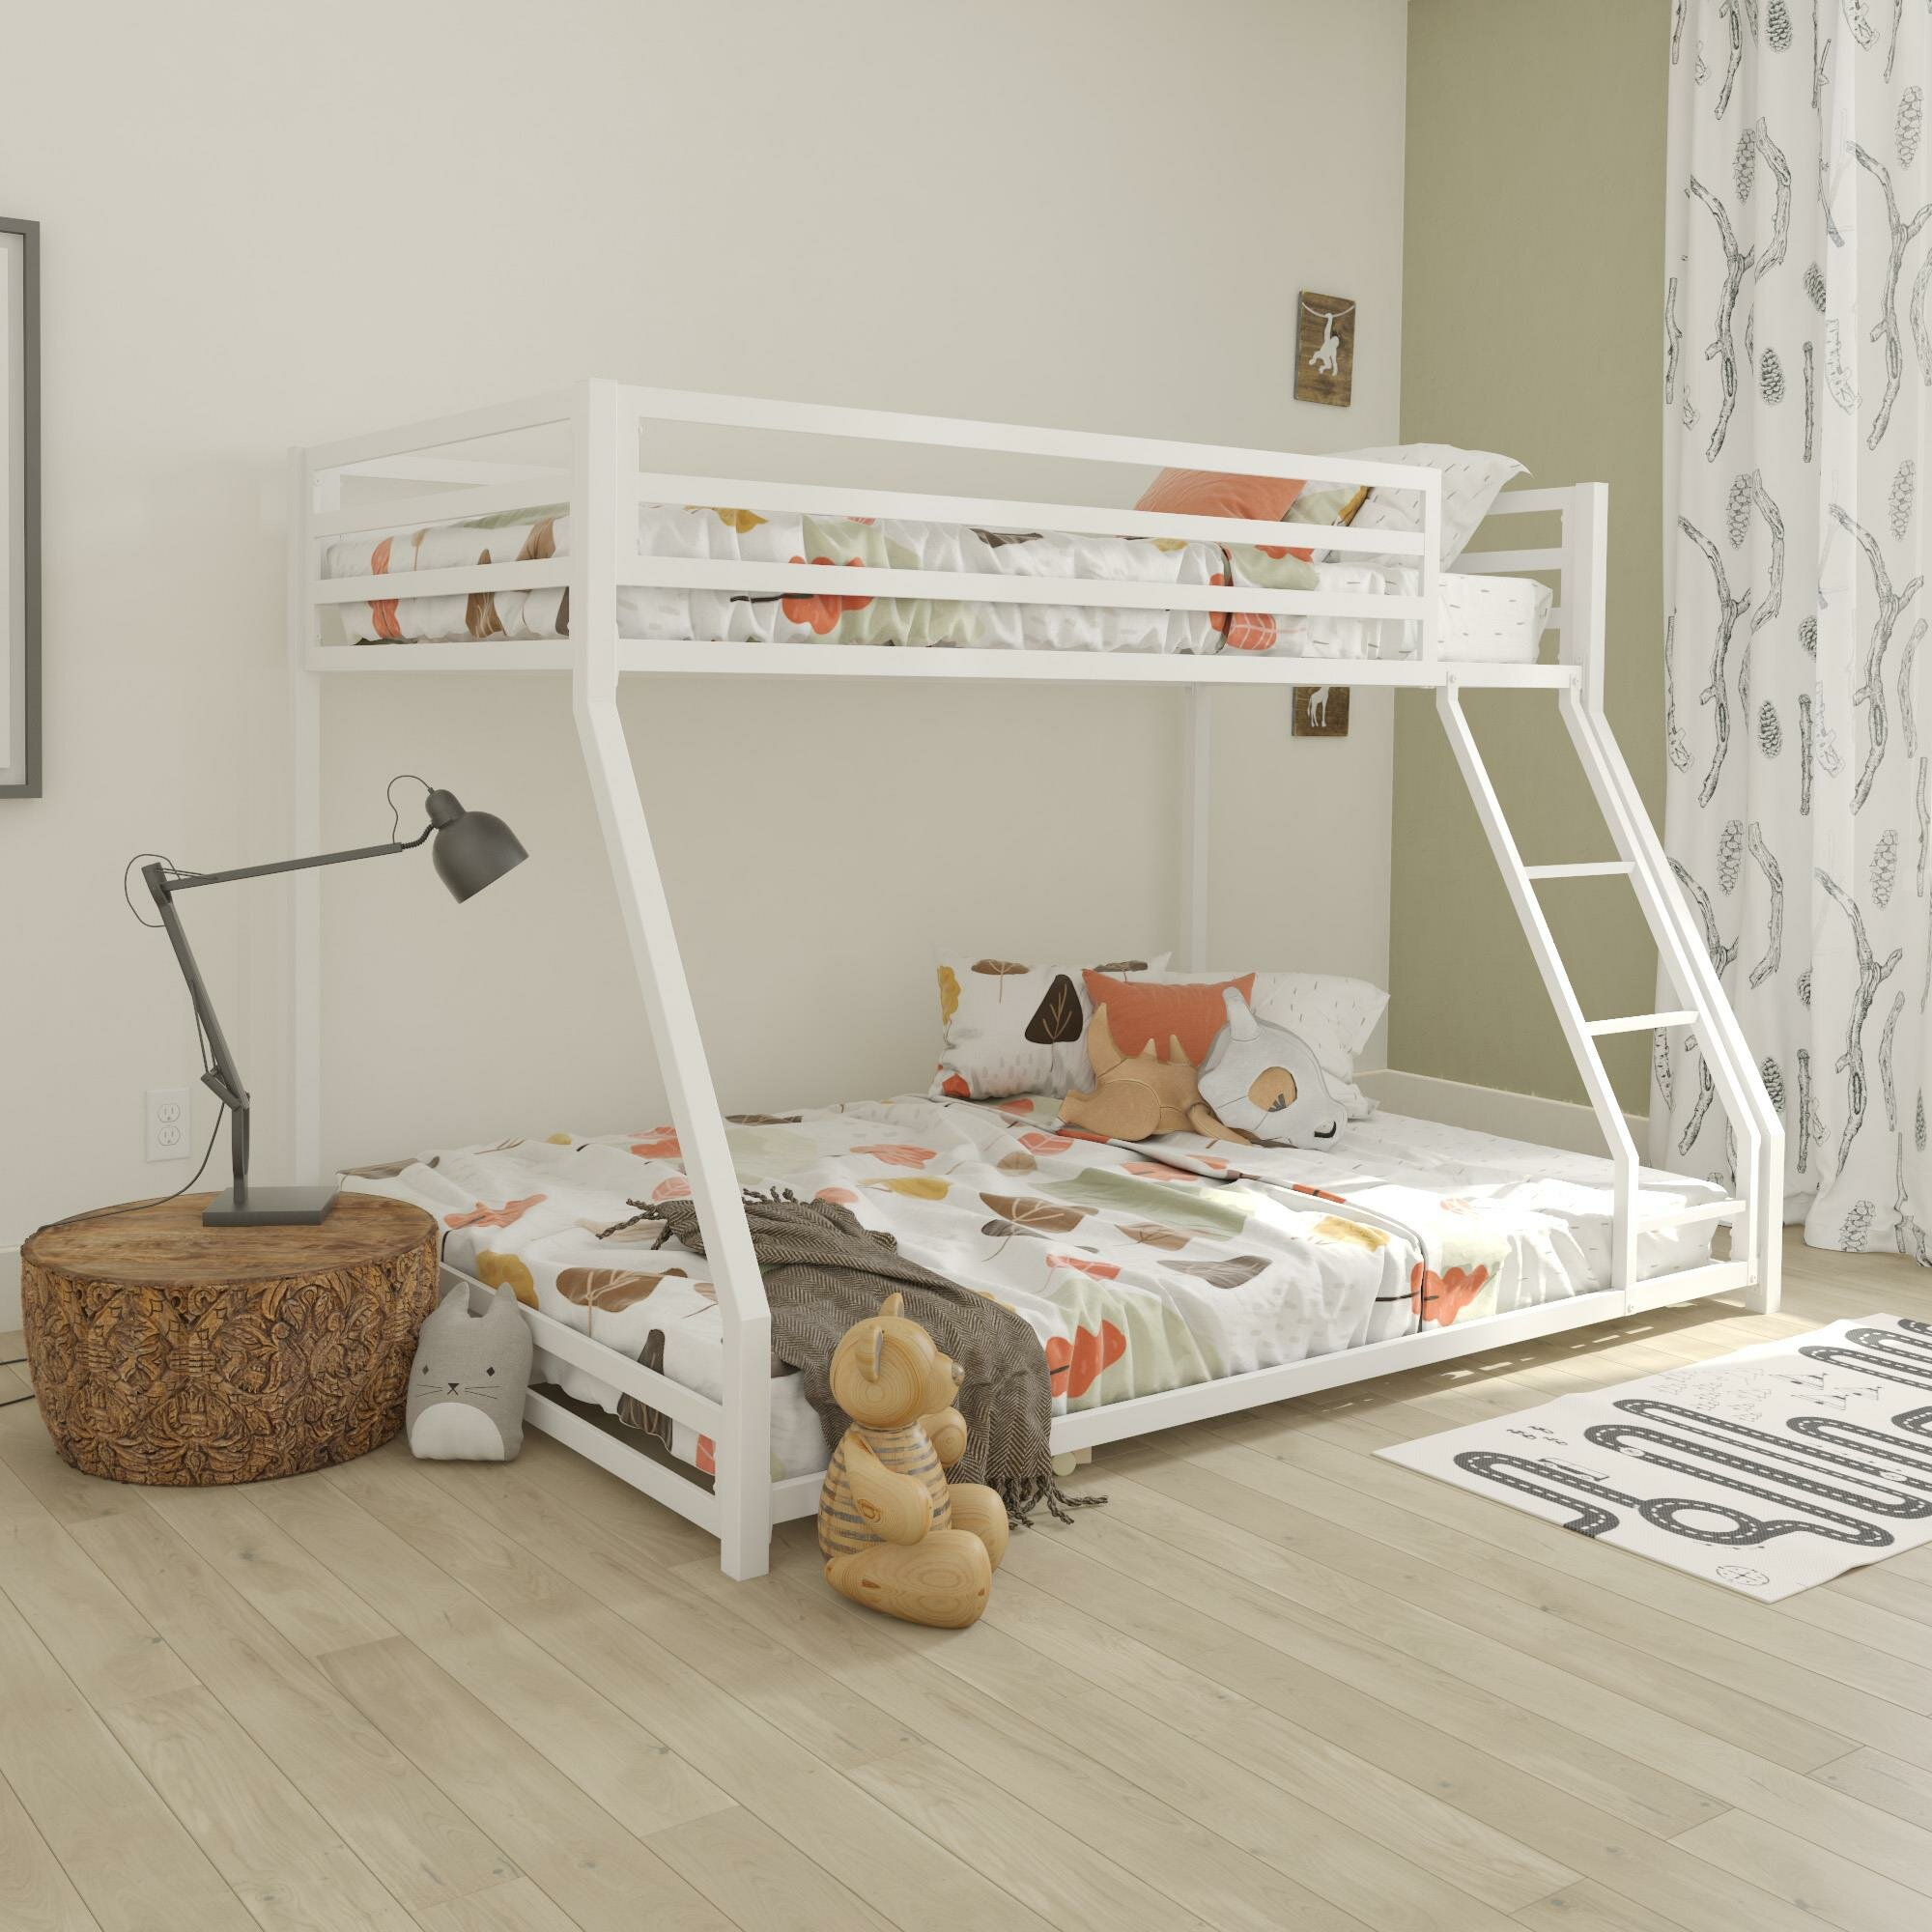 Bunk Modern Contemporary Kids Beds You Ll Love In 2021 Wayfair